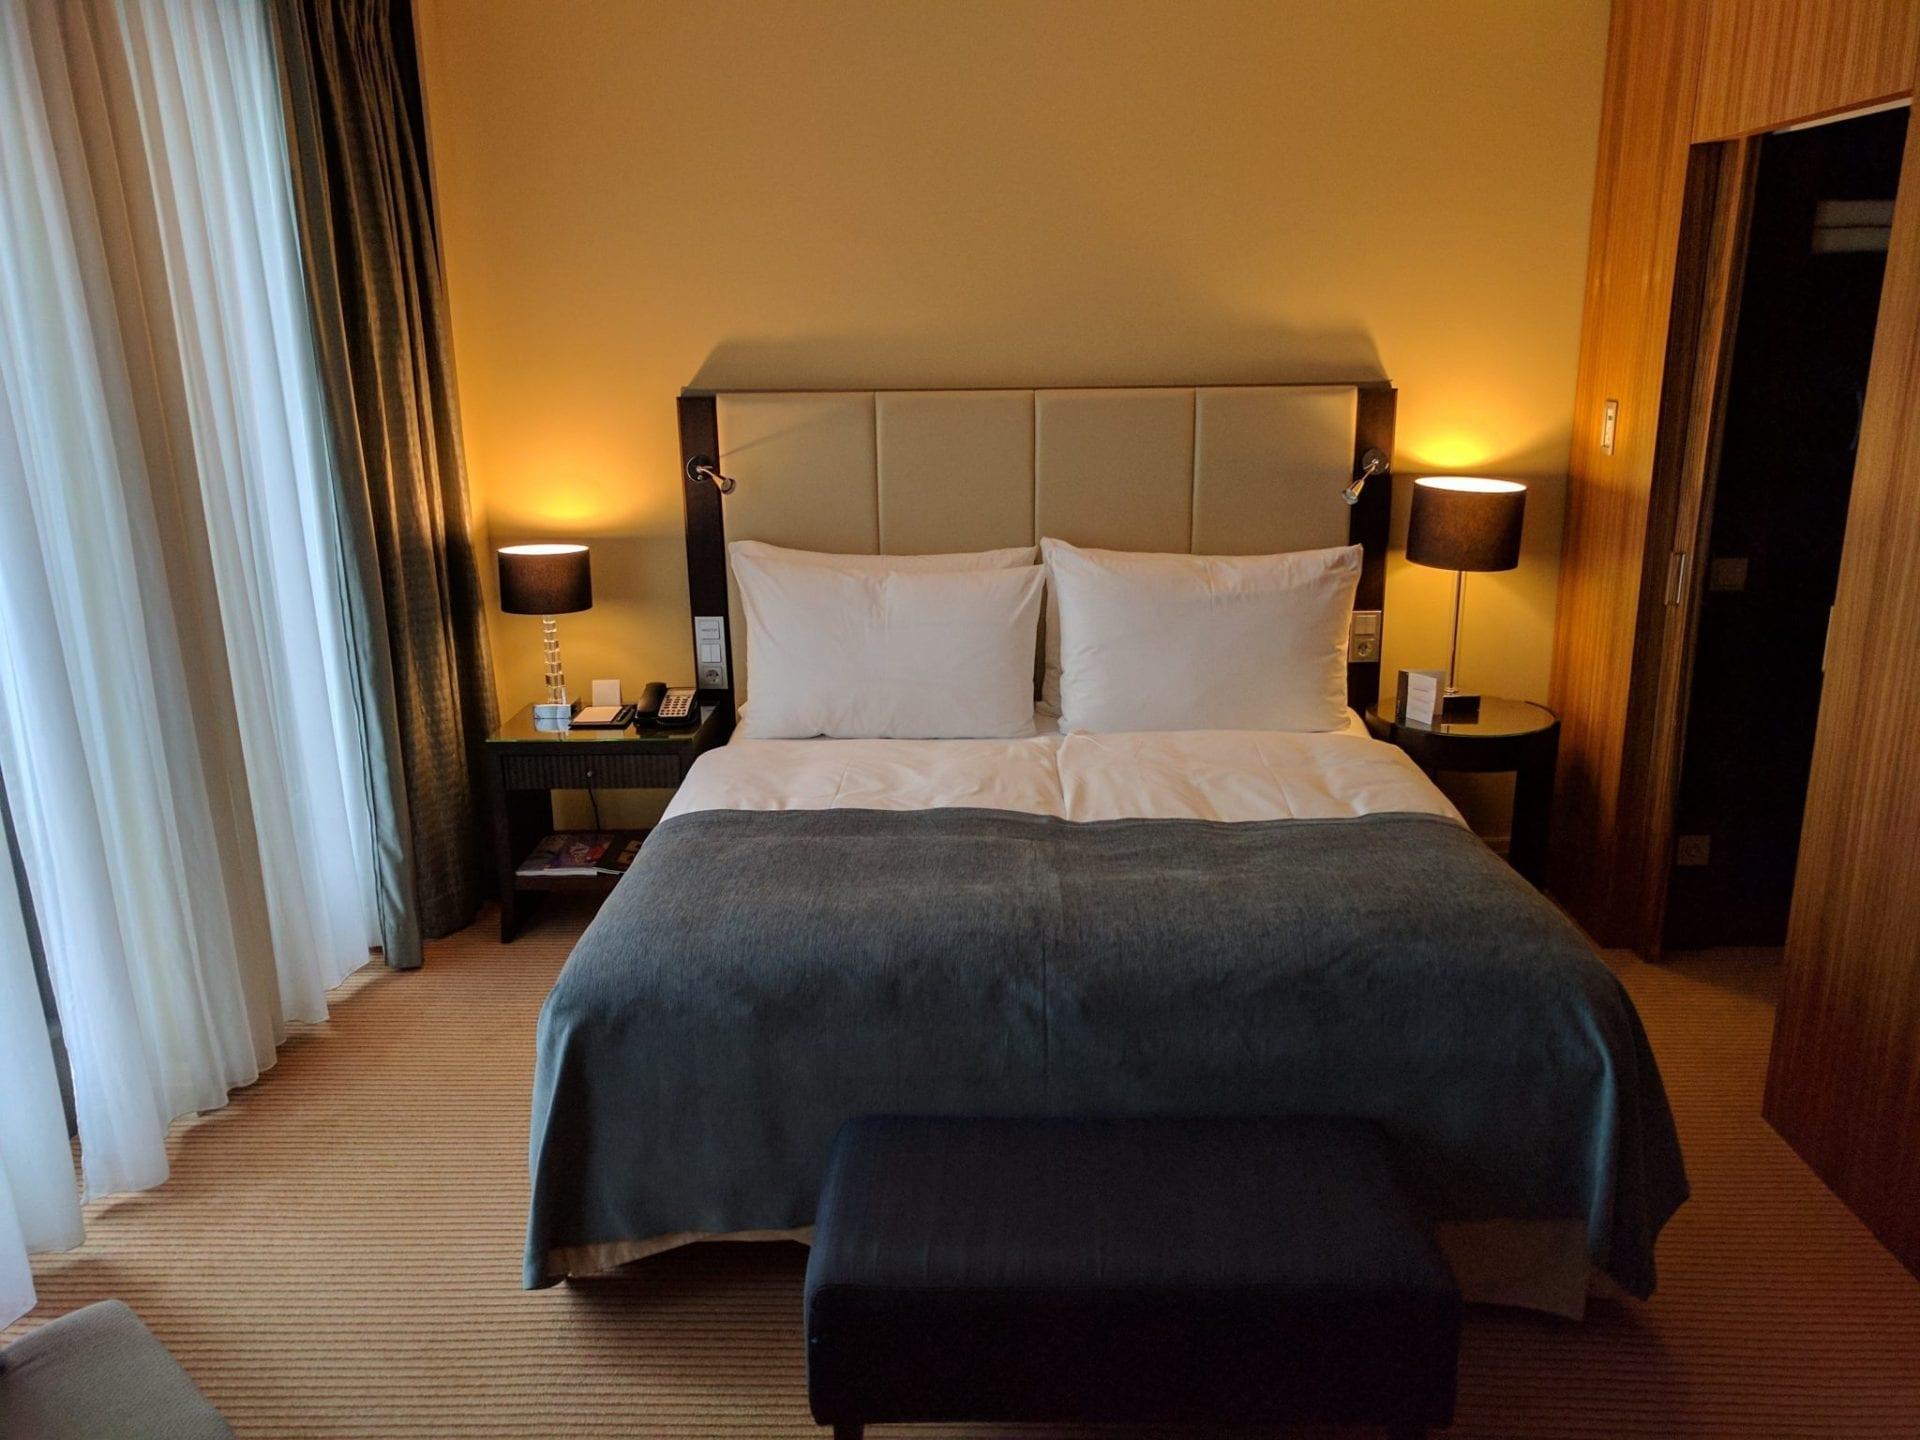 intercontinental d sseldorf king bett. Black Bedroom Furniture Sets. Home Design Ideas